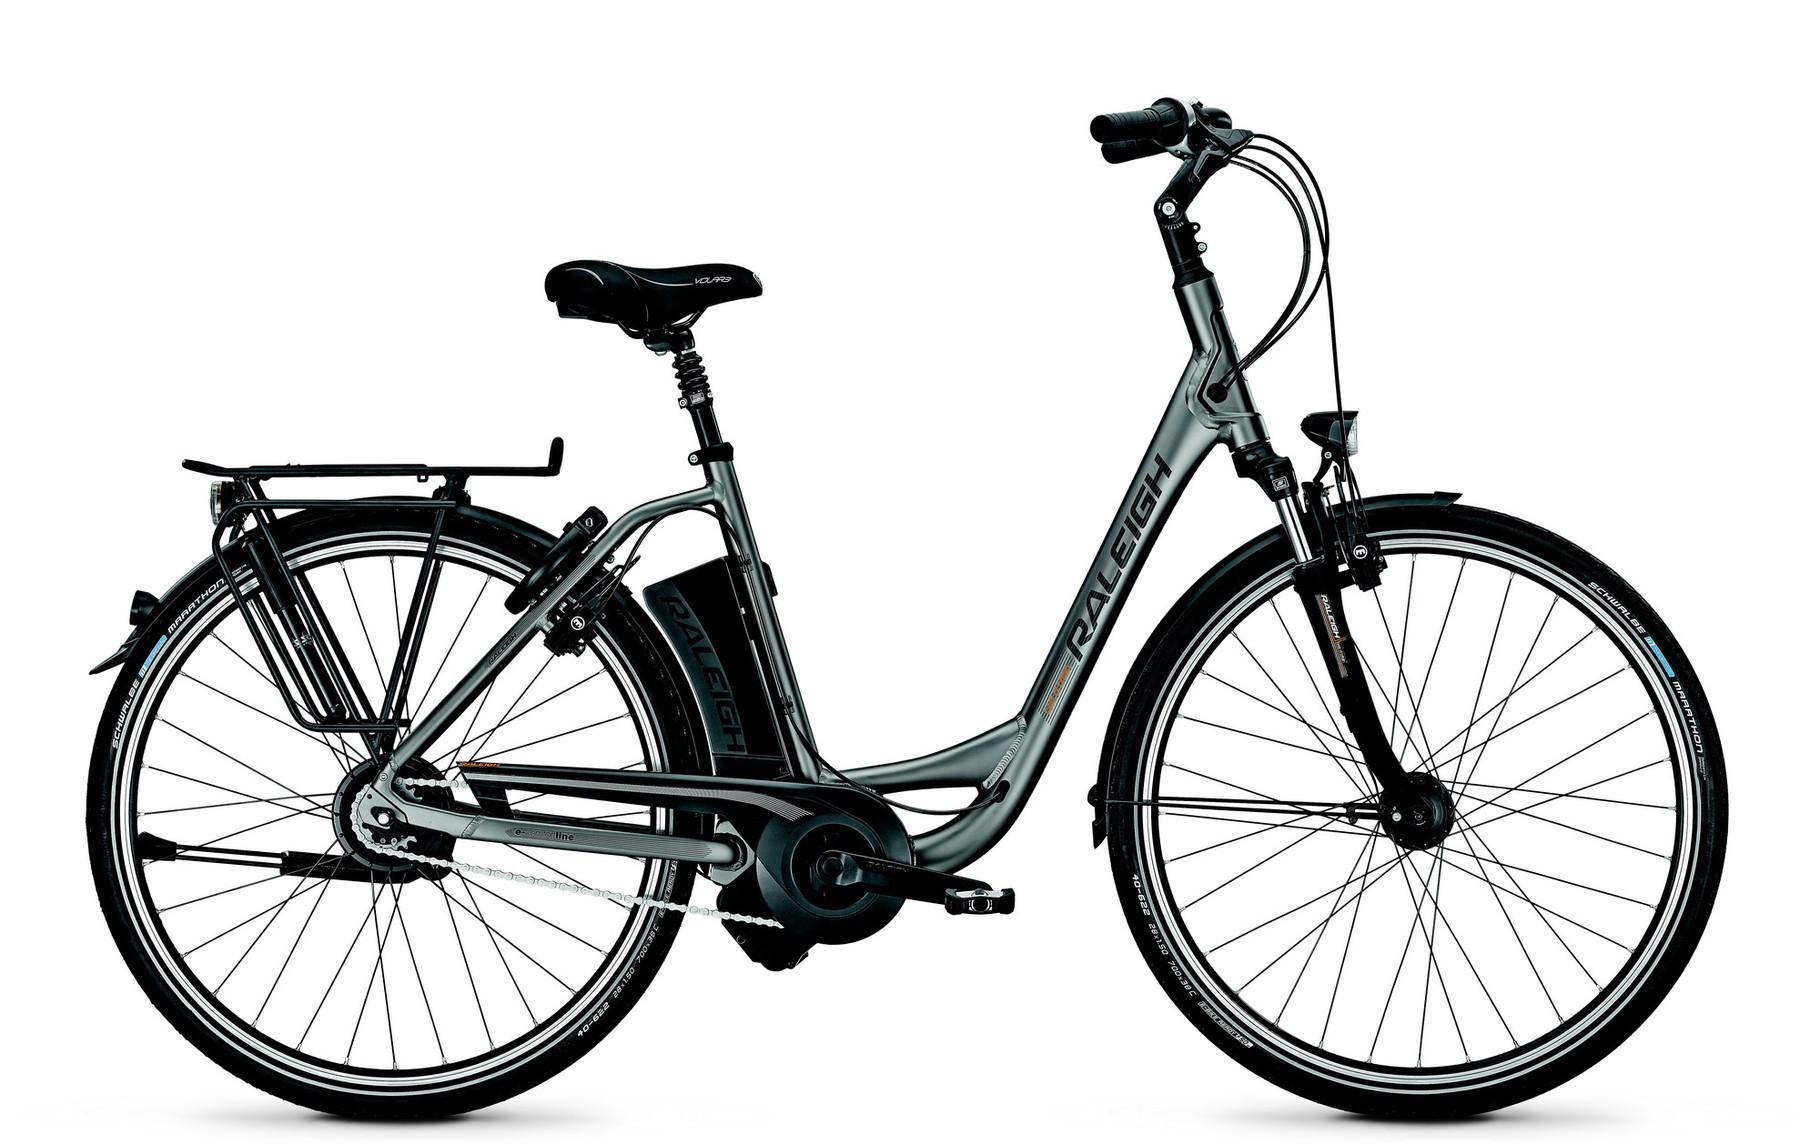 raleigh dover impulse 360 e bike 2015 e motion e bikes. Black Bedroom Furniture Sets. Home Design Ideas